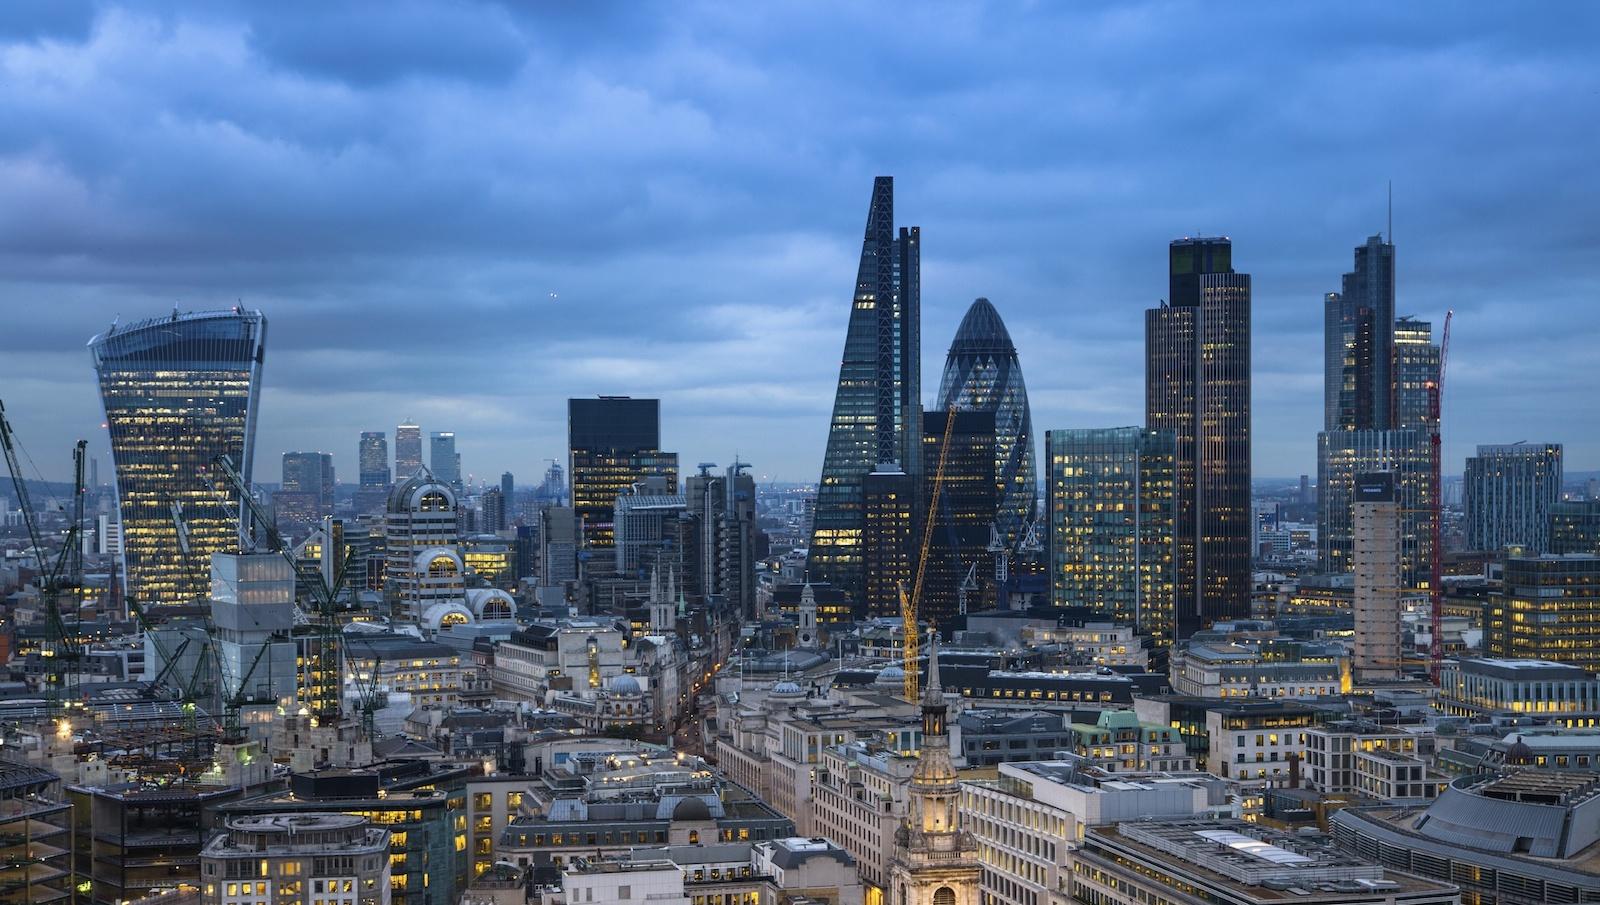 london_skyline pas toucher copy 4